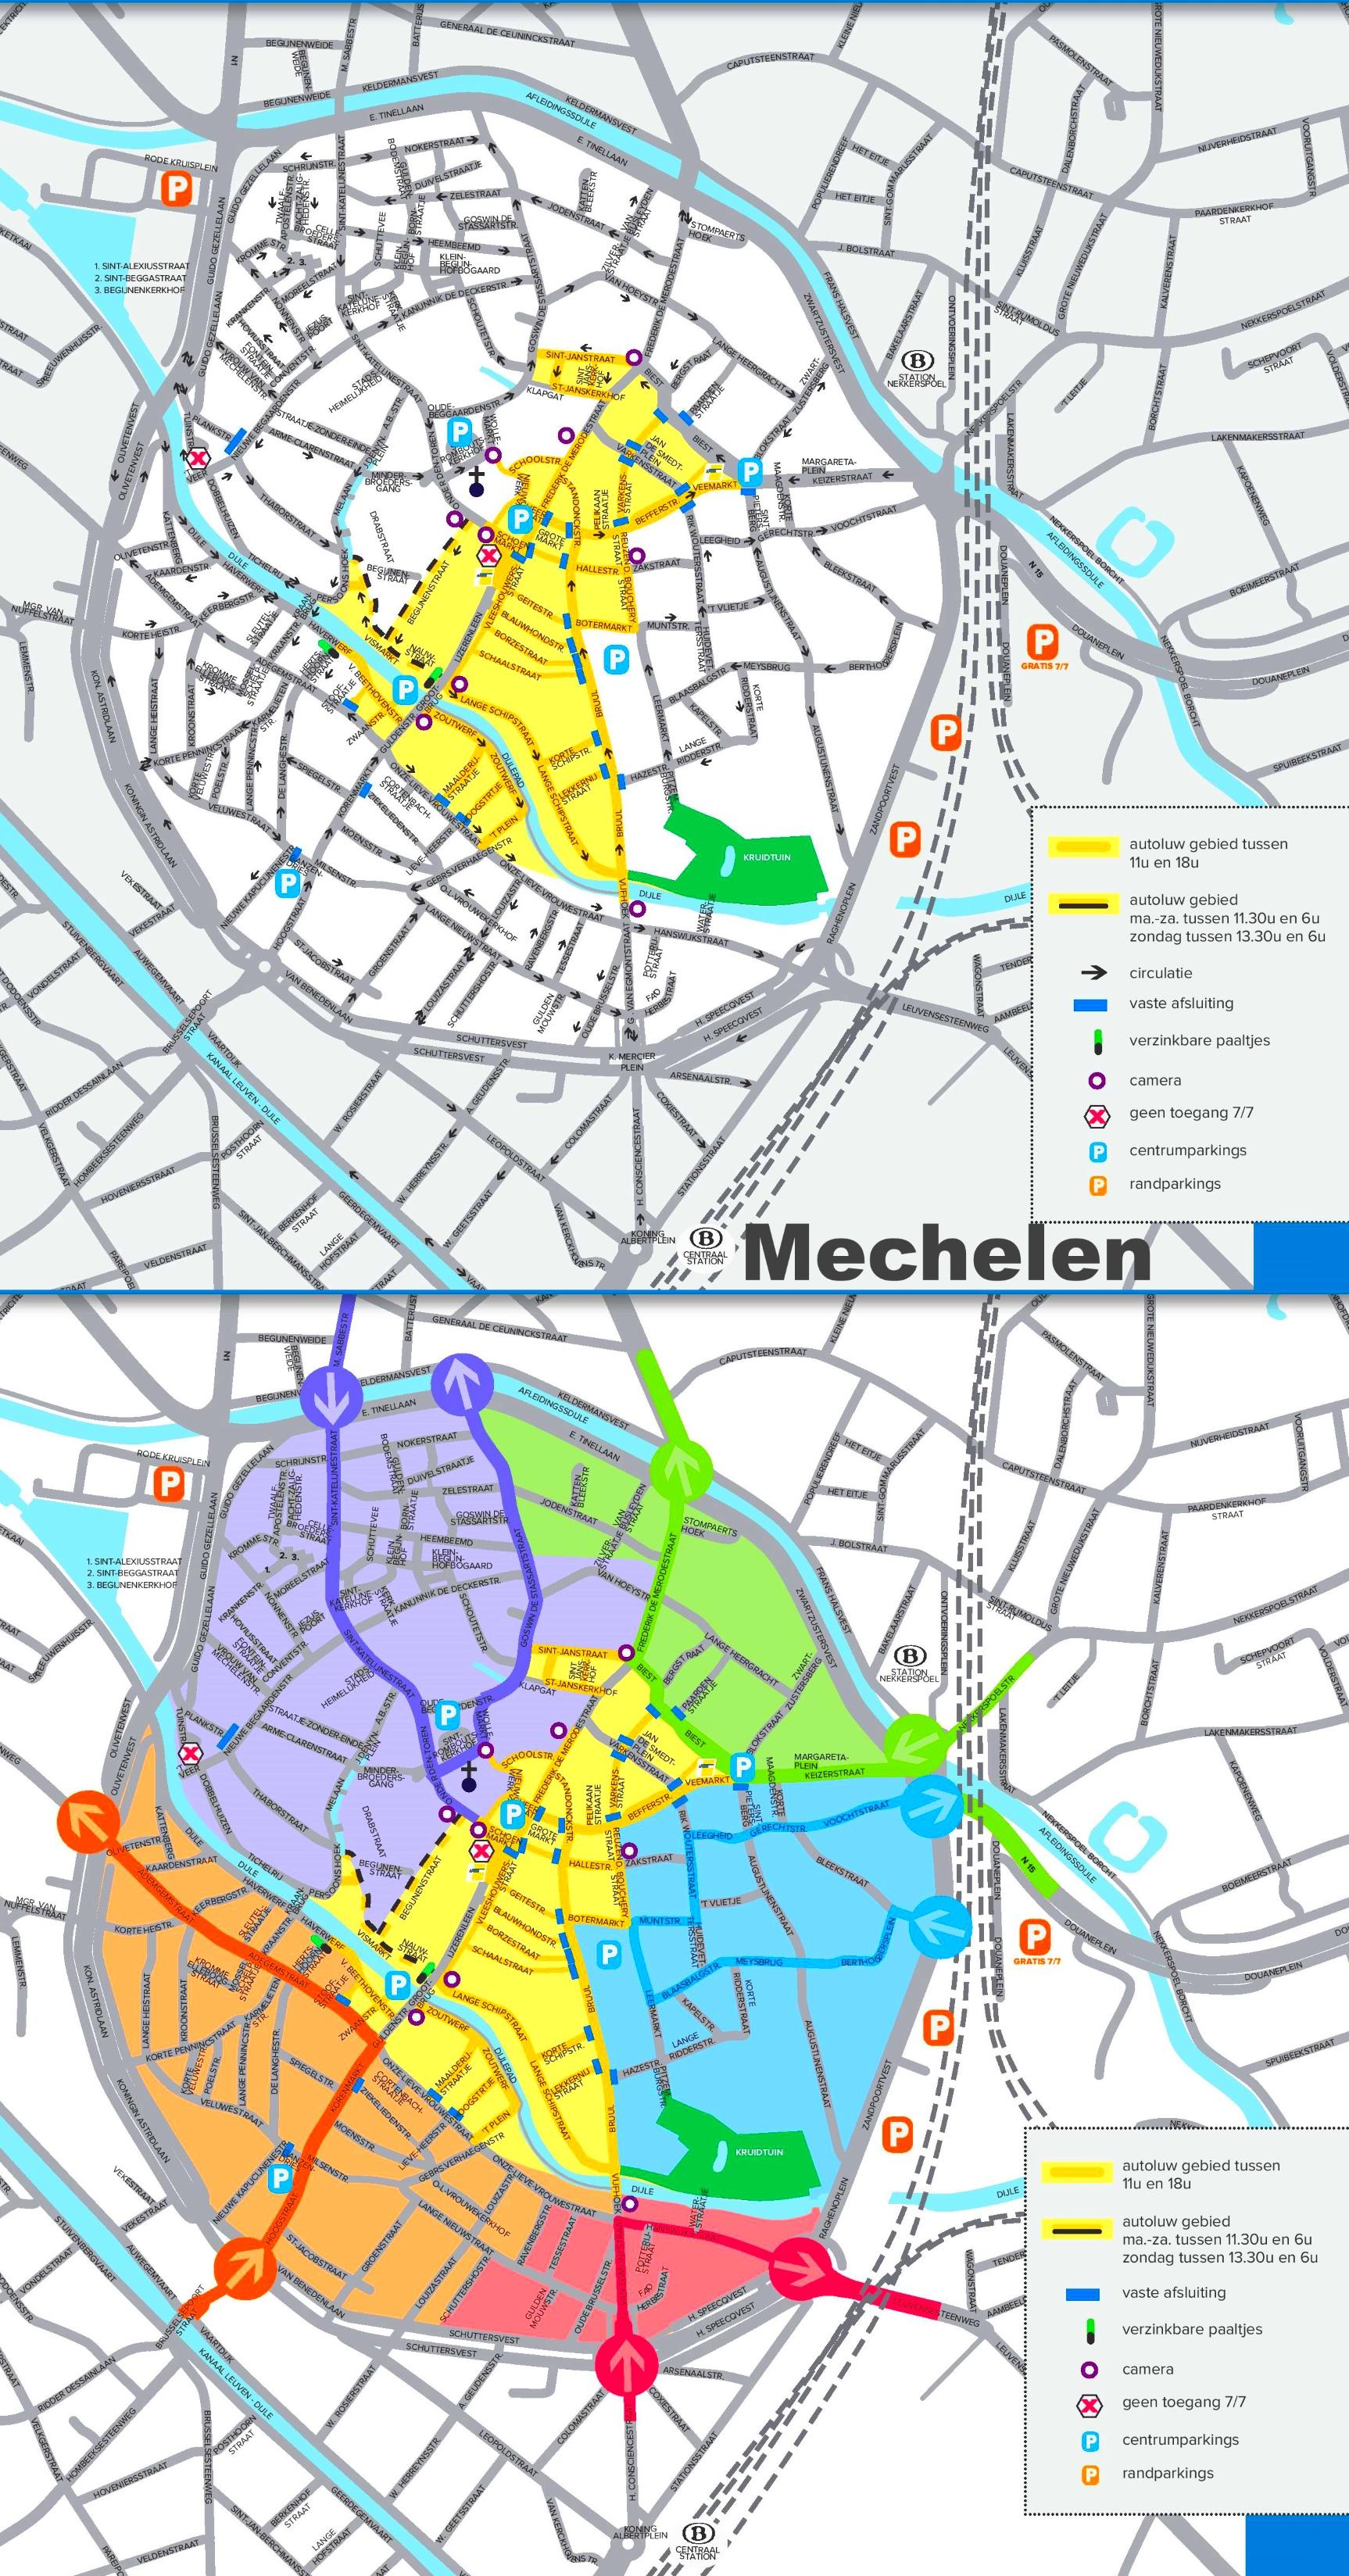 Mechelen road map